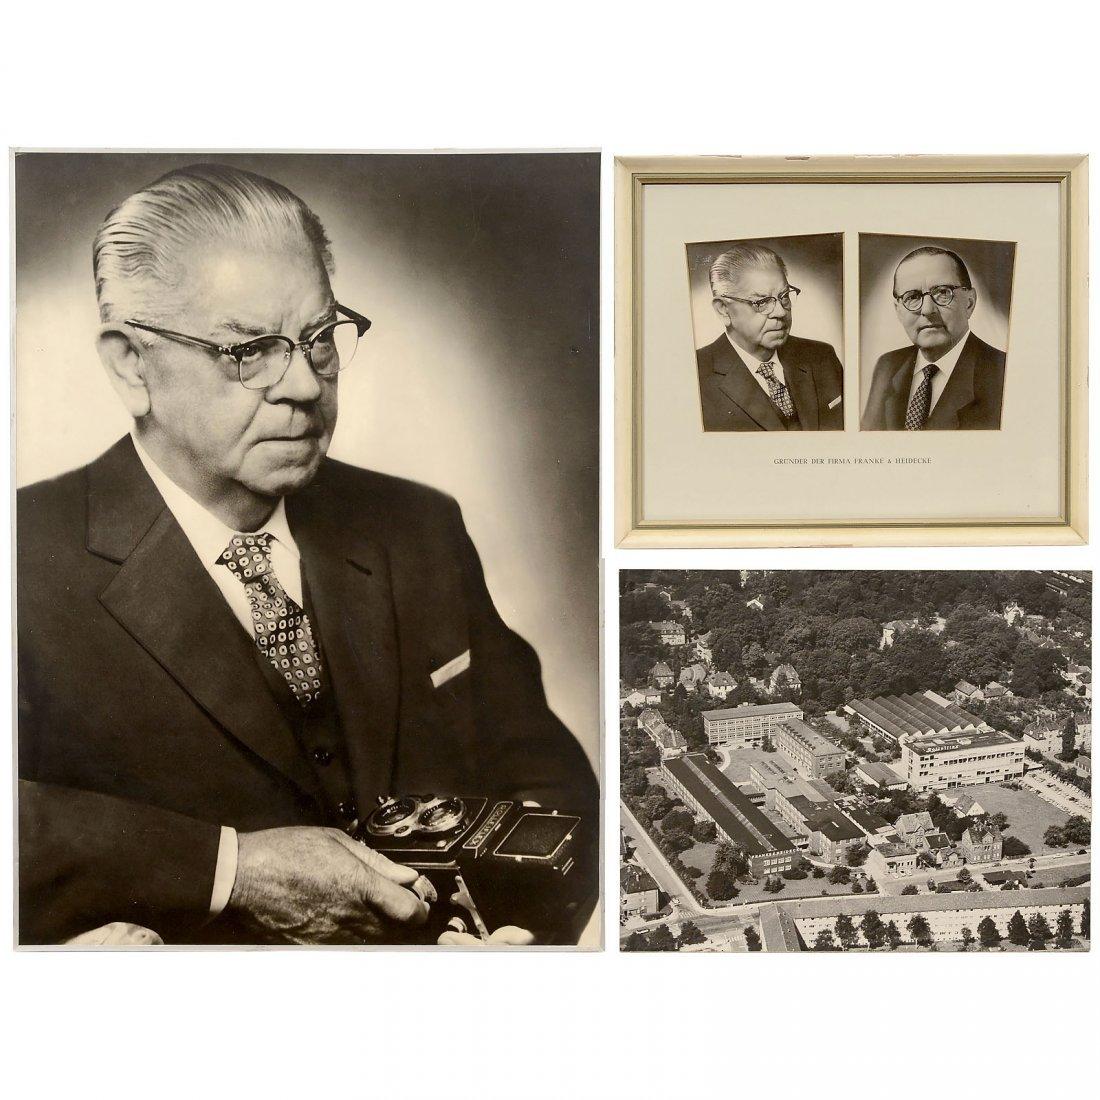 Portrait Photographs by Franke & Heidecke, 1950s